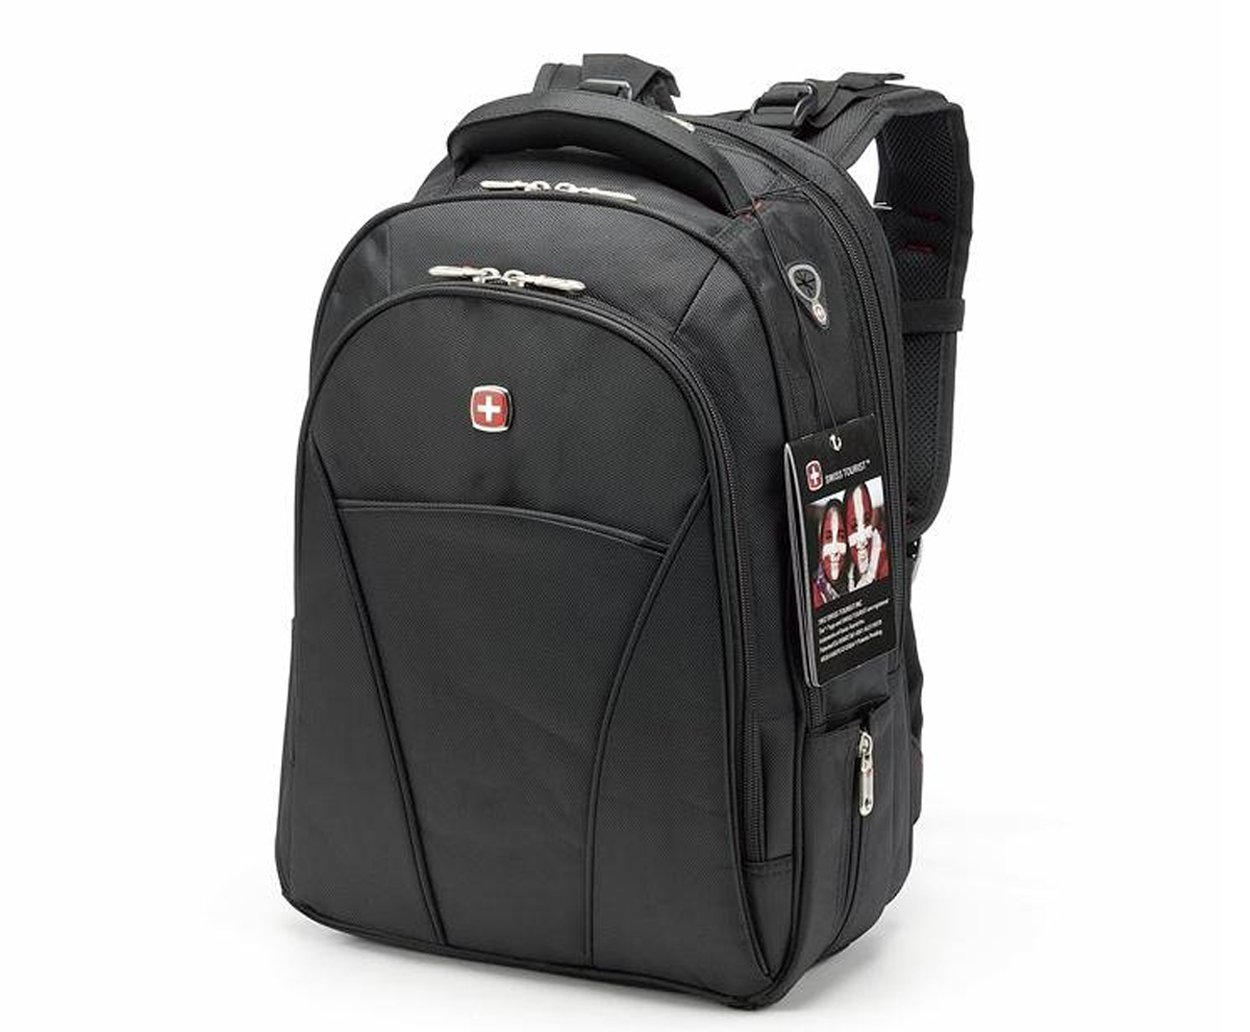 SWISS Travel Business Laptop Rucksack 15,6 Notebook Gesch/äfts Tasche Reisetasche